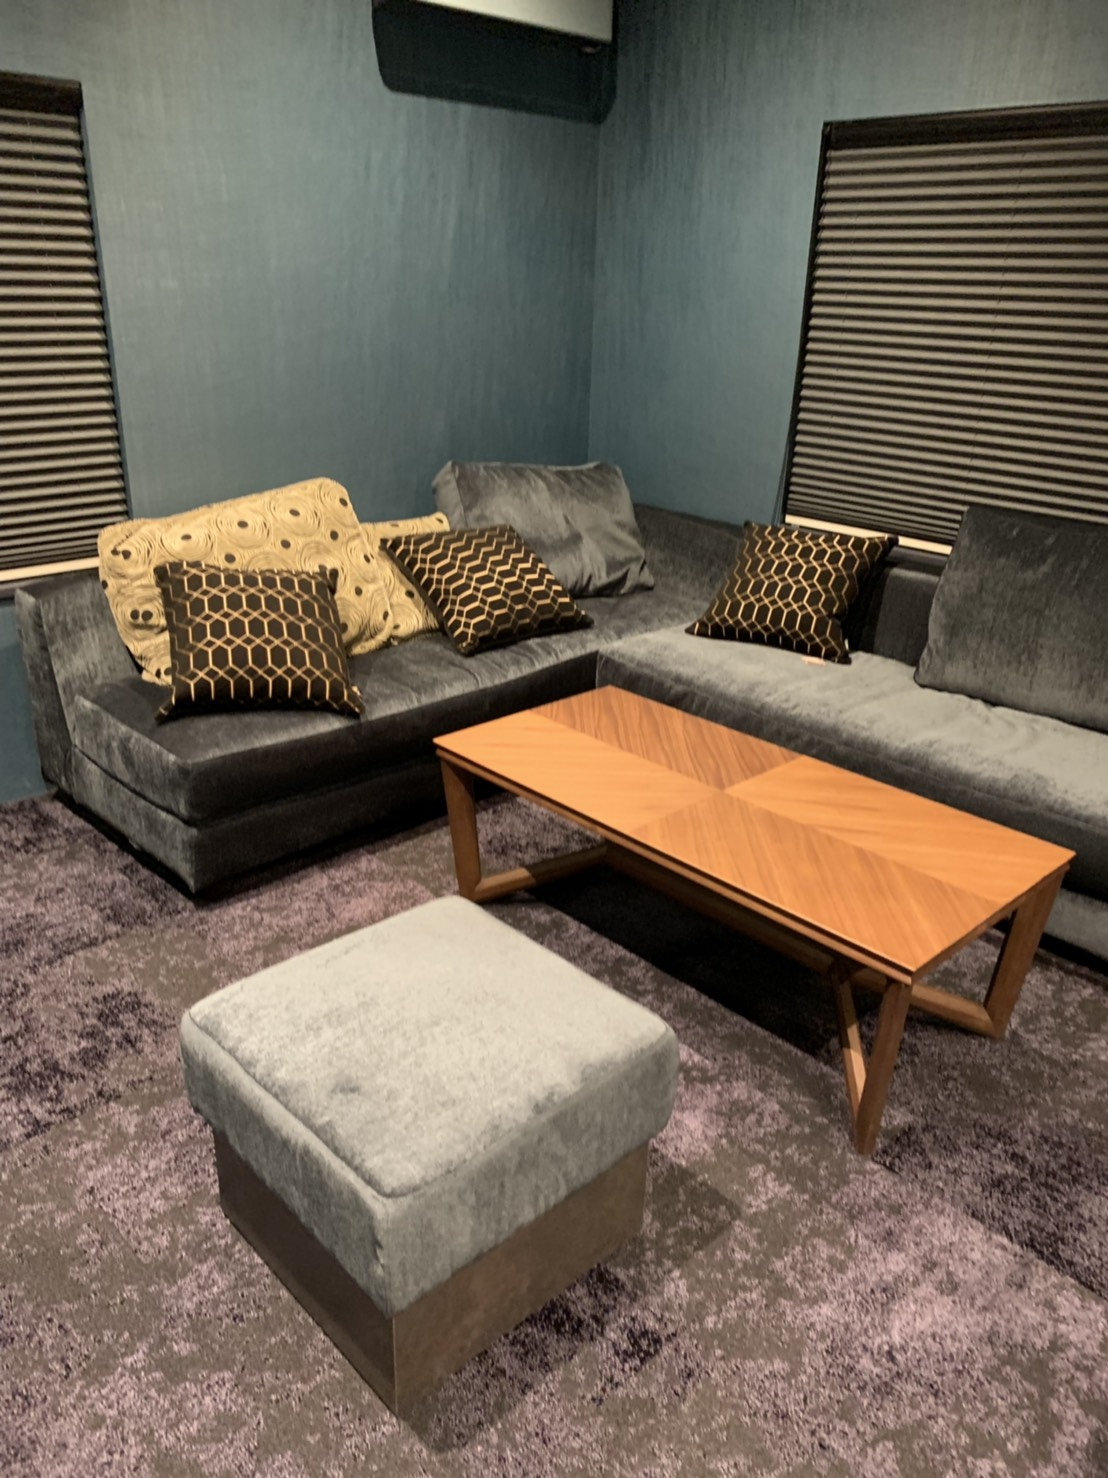 Hukla社の高級ソファー